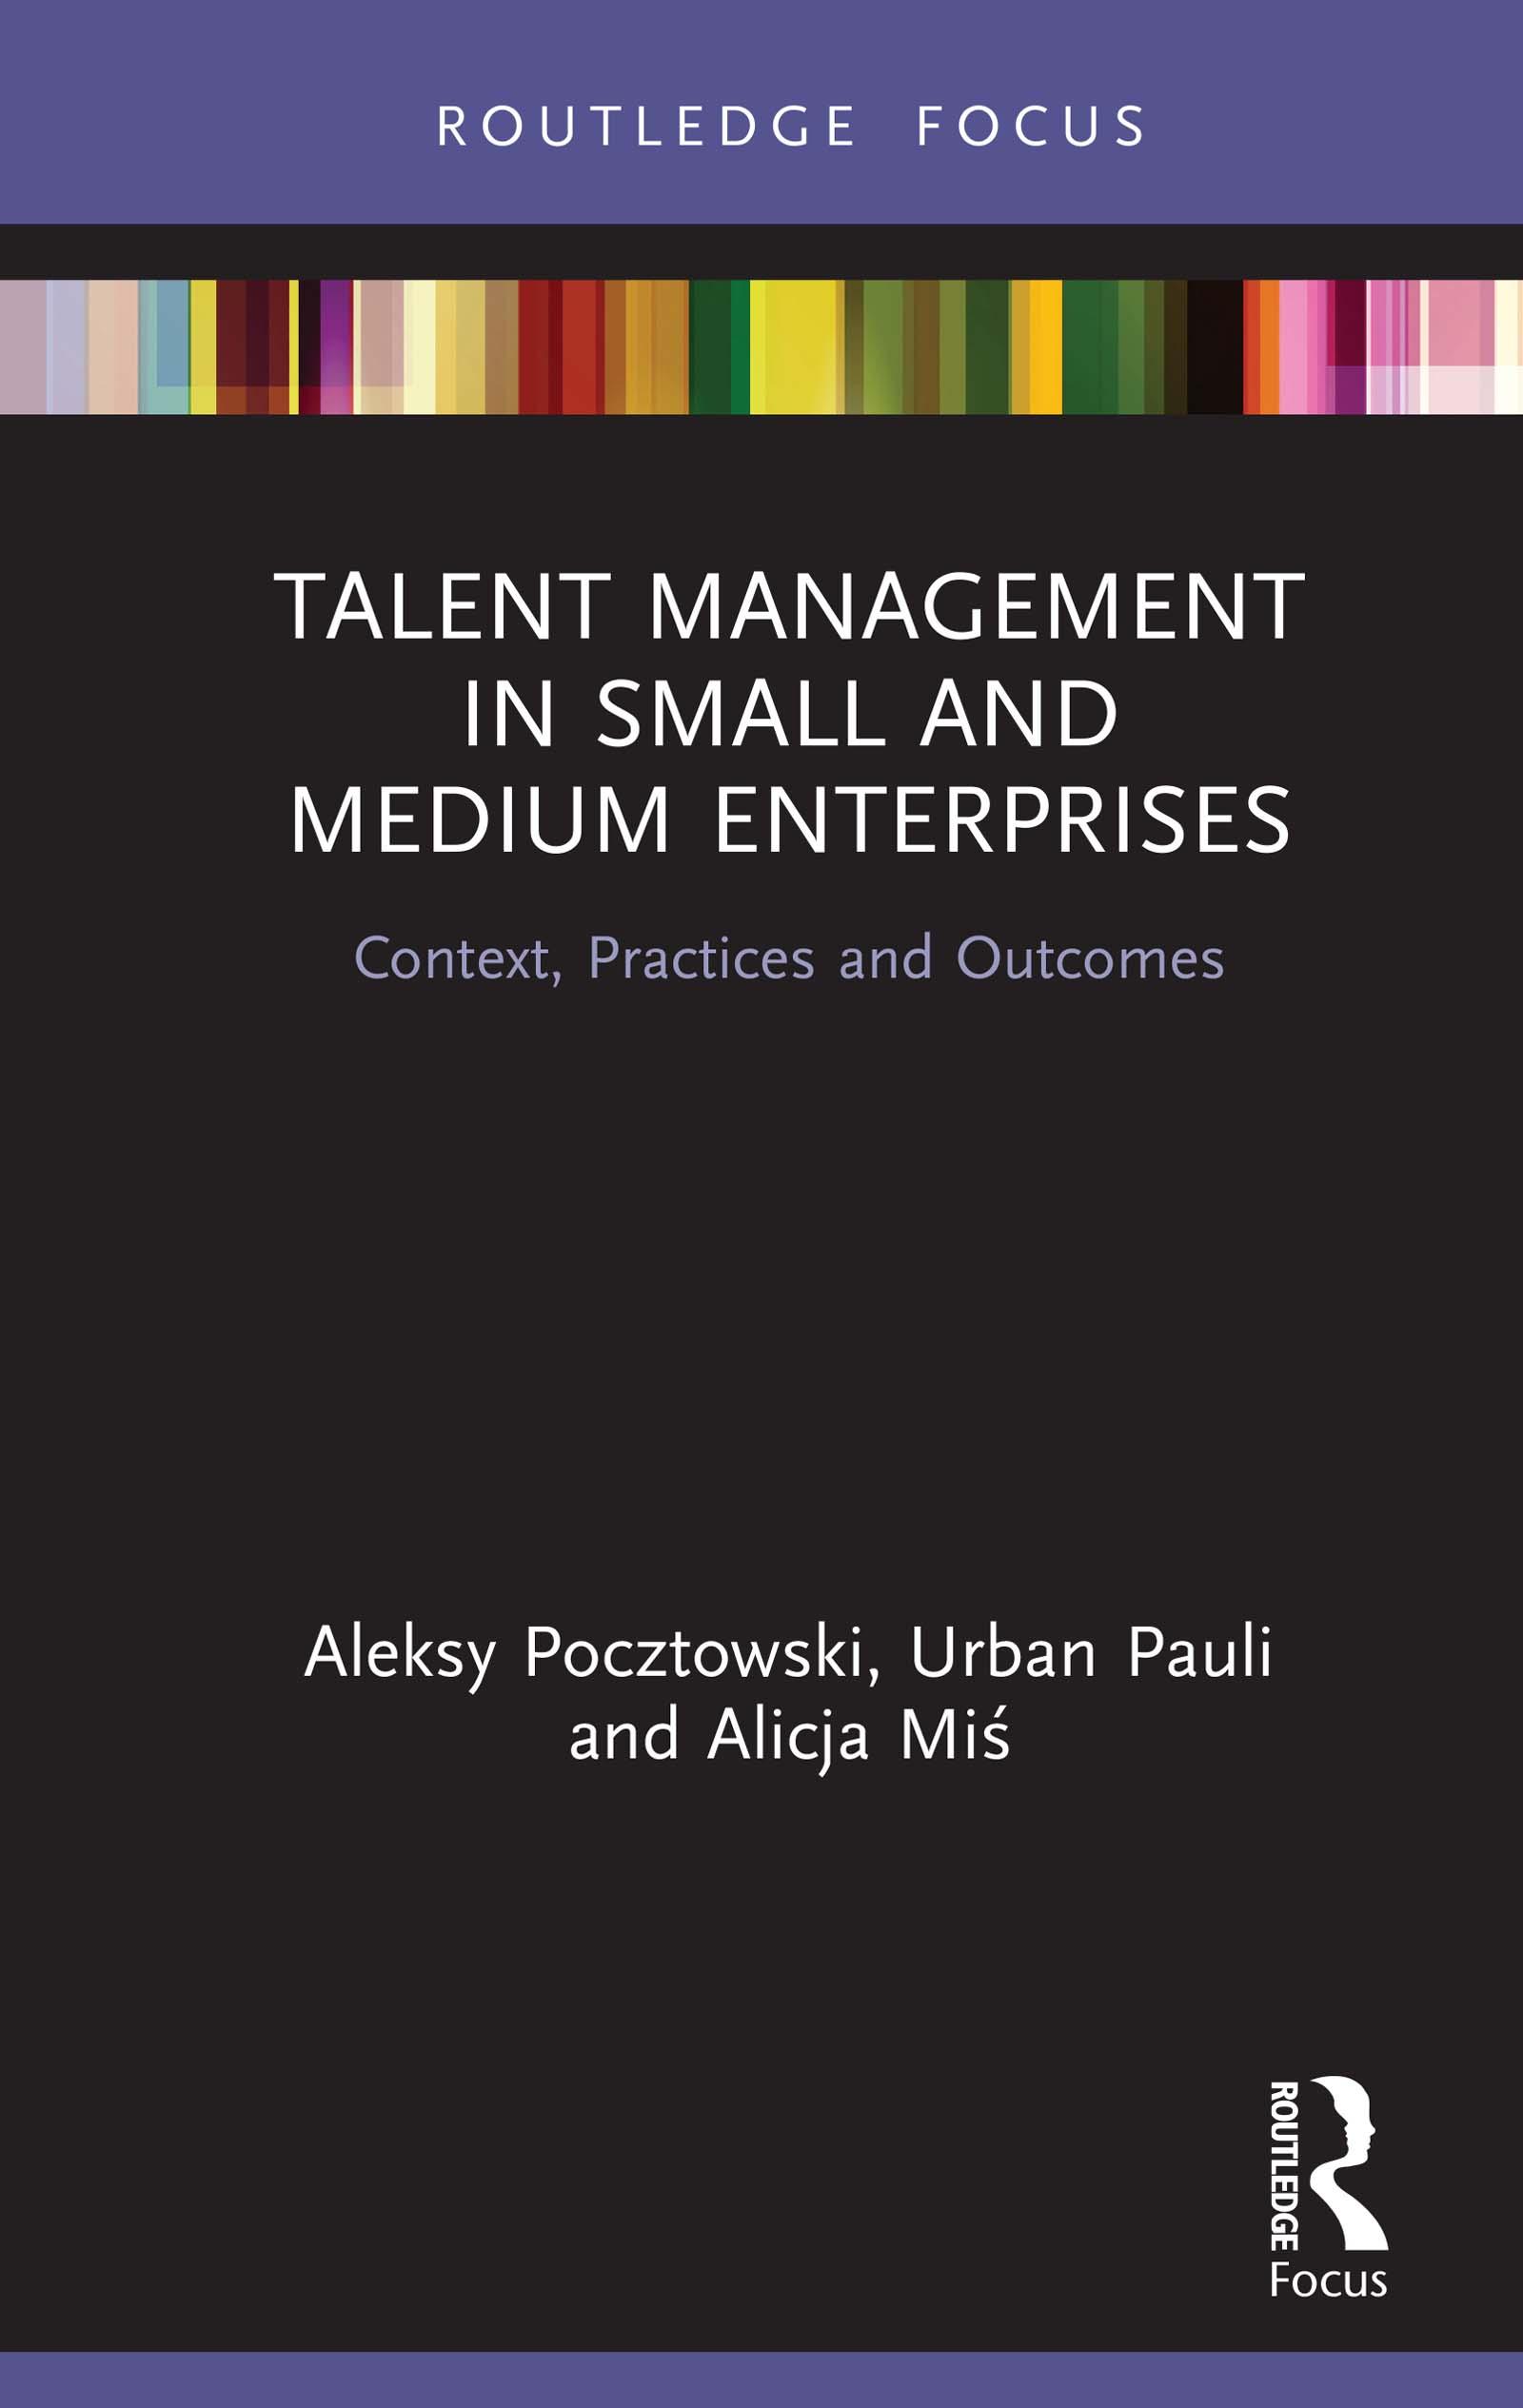 Talent Management in Small and Medium Enterprises